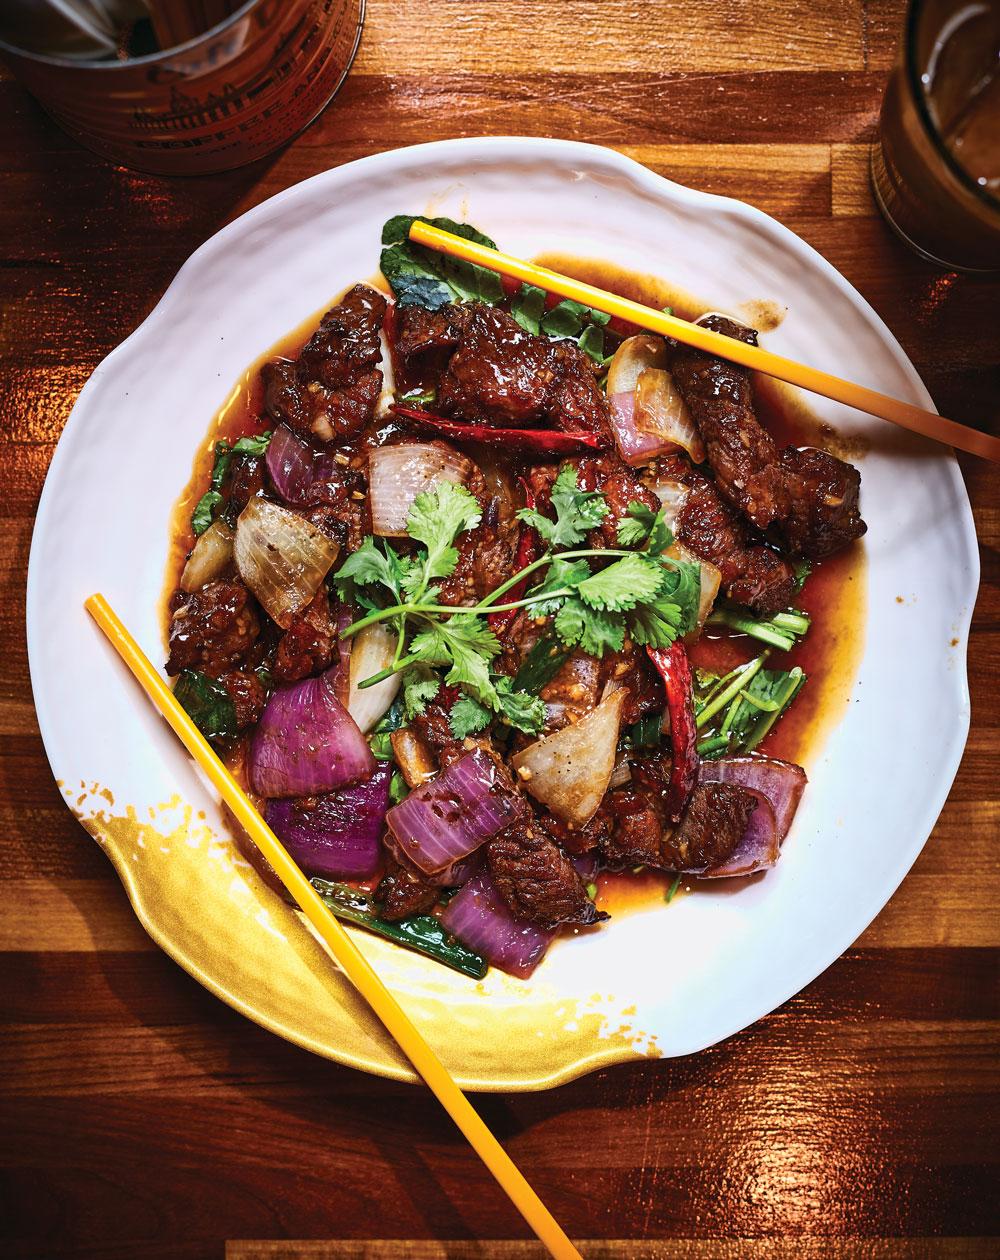 Review Anh S Kitchen Serves Excellent Authentic Vietnamese